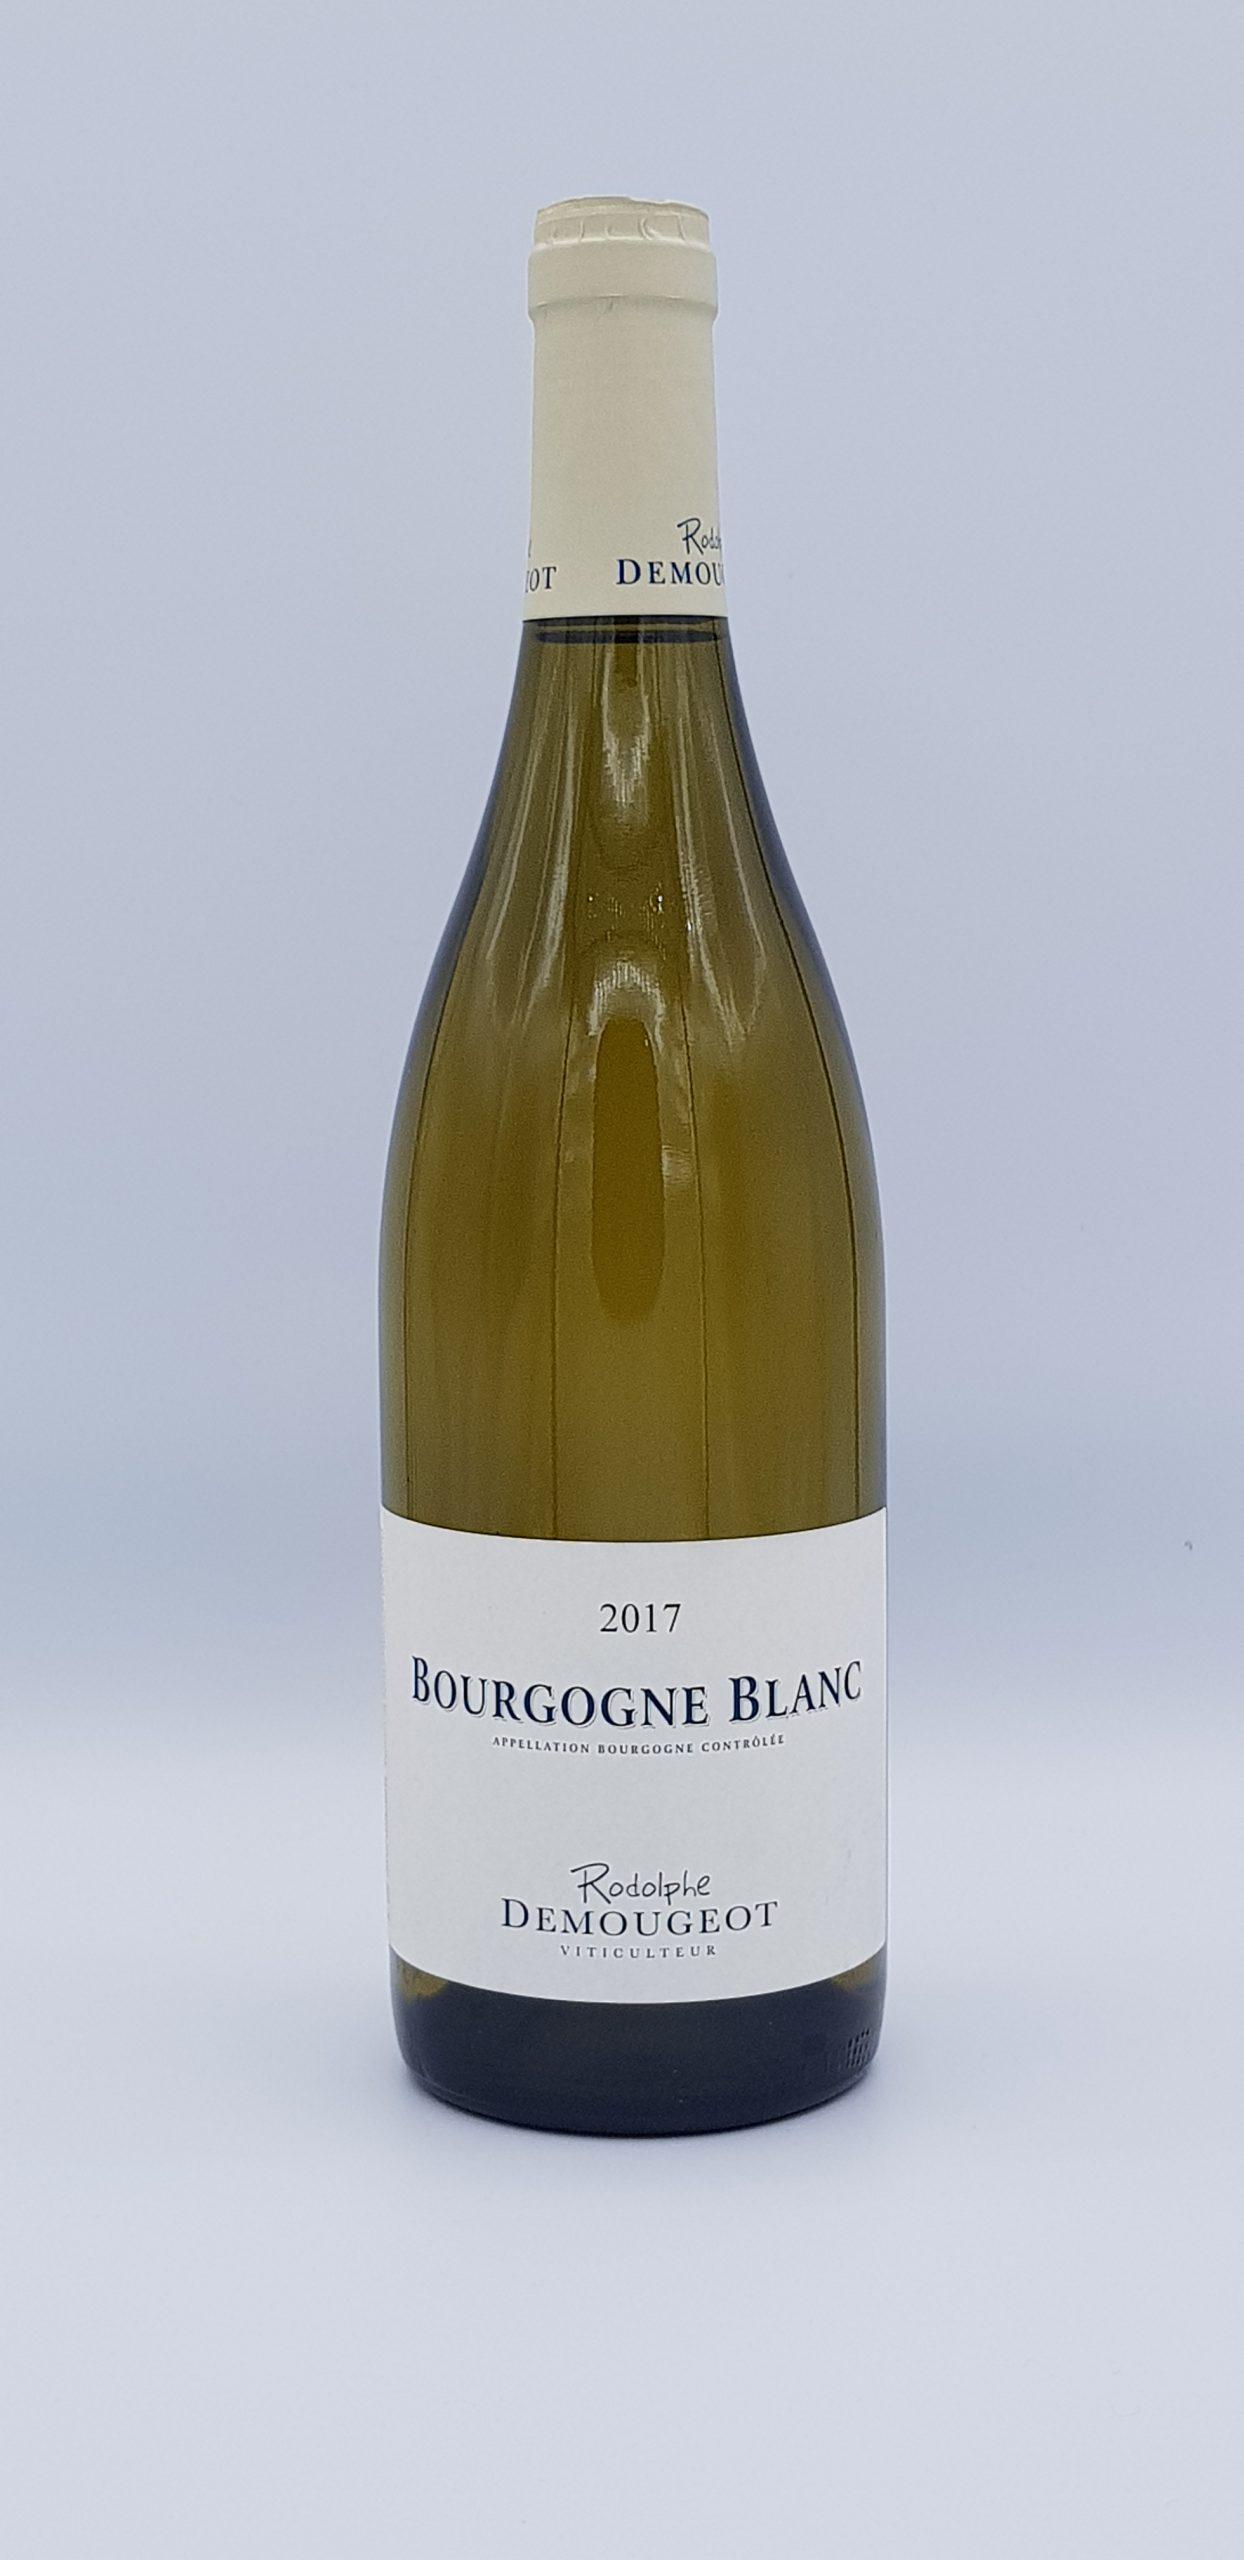 Bourgogne Blanc 2017